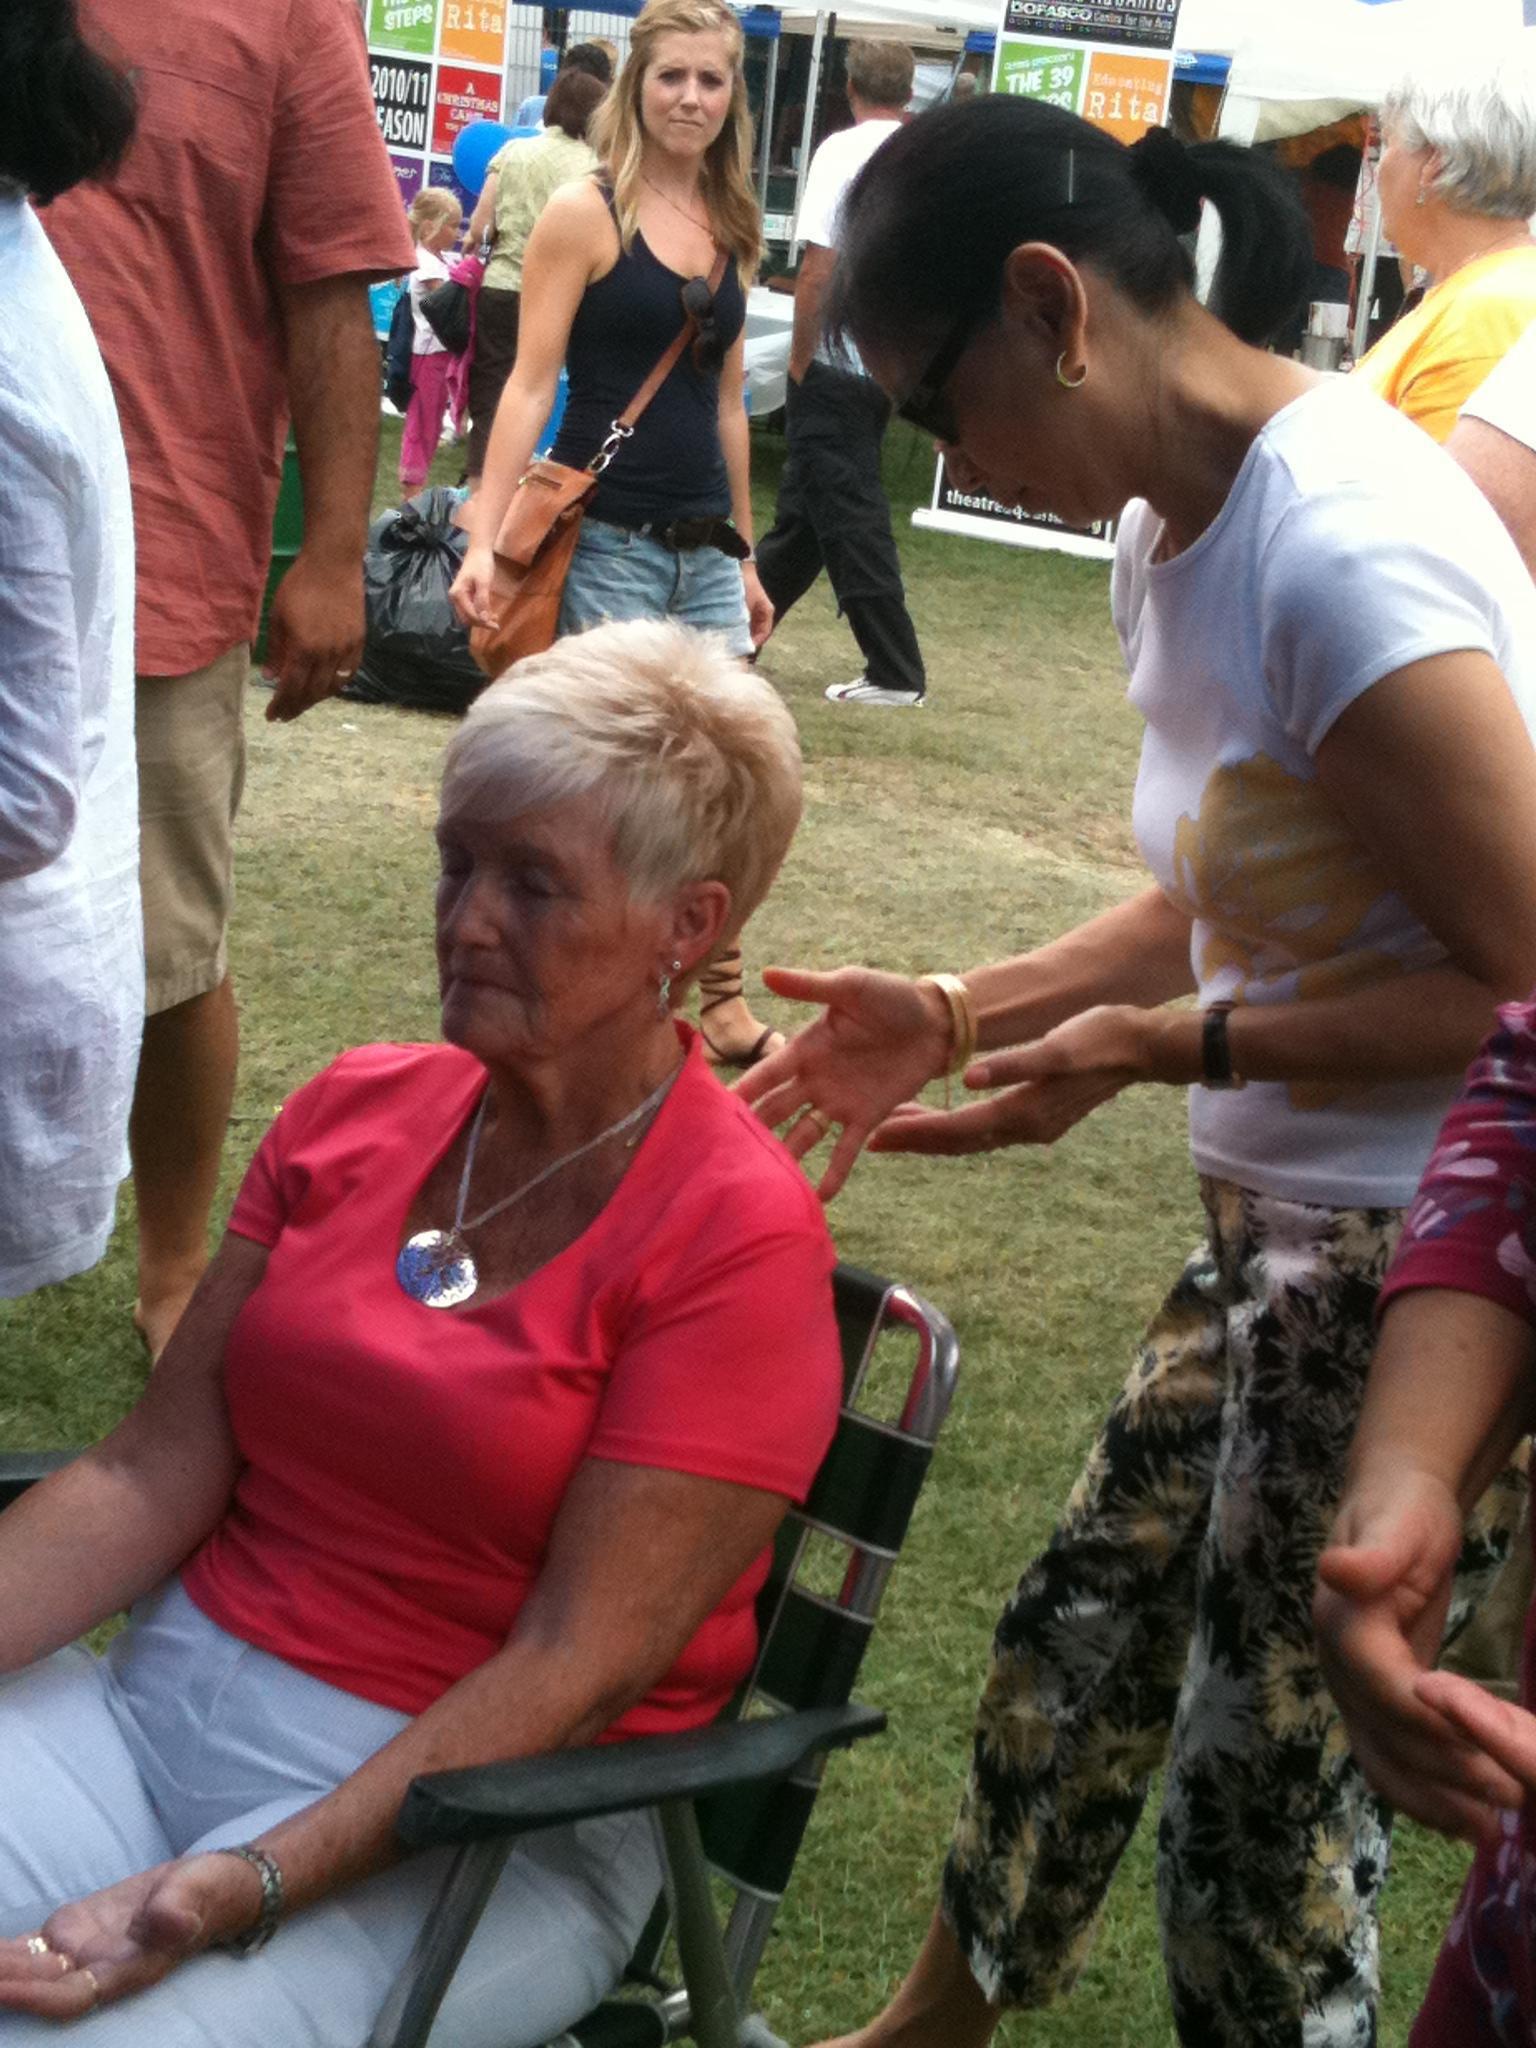 Read more about the article Enjoy Photos from Hamilton's Festival of Friends & Burlington's Joseph Brant Day Festival